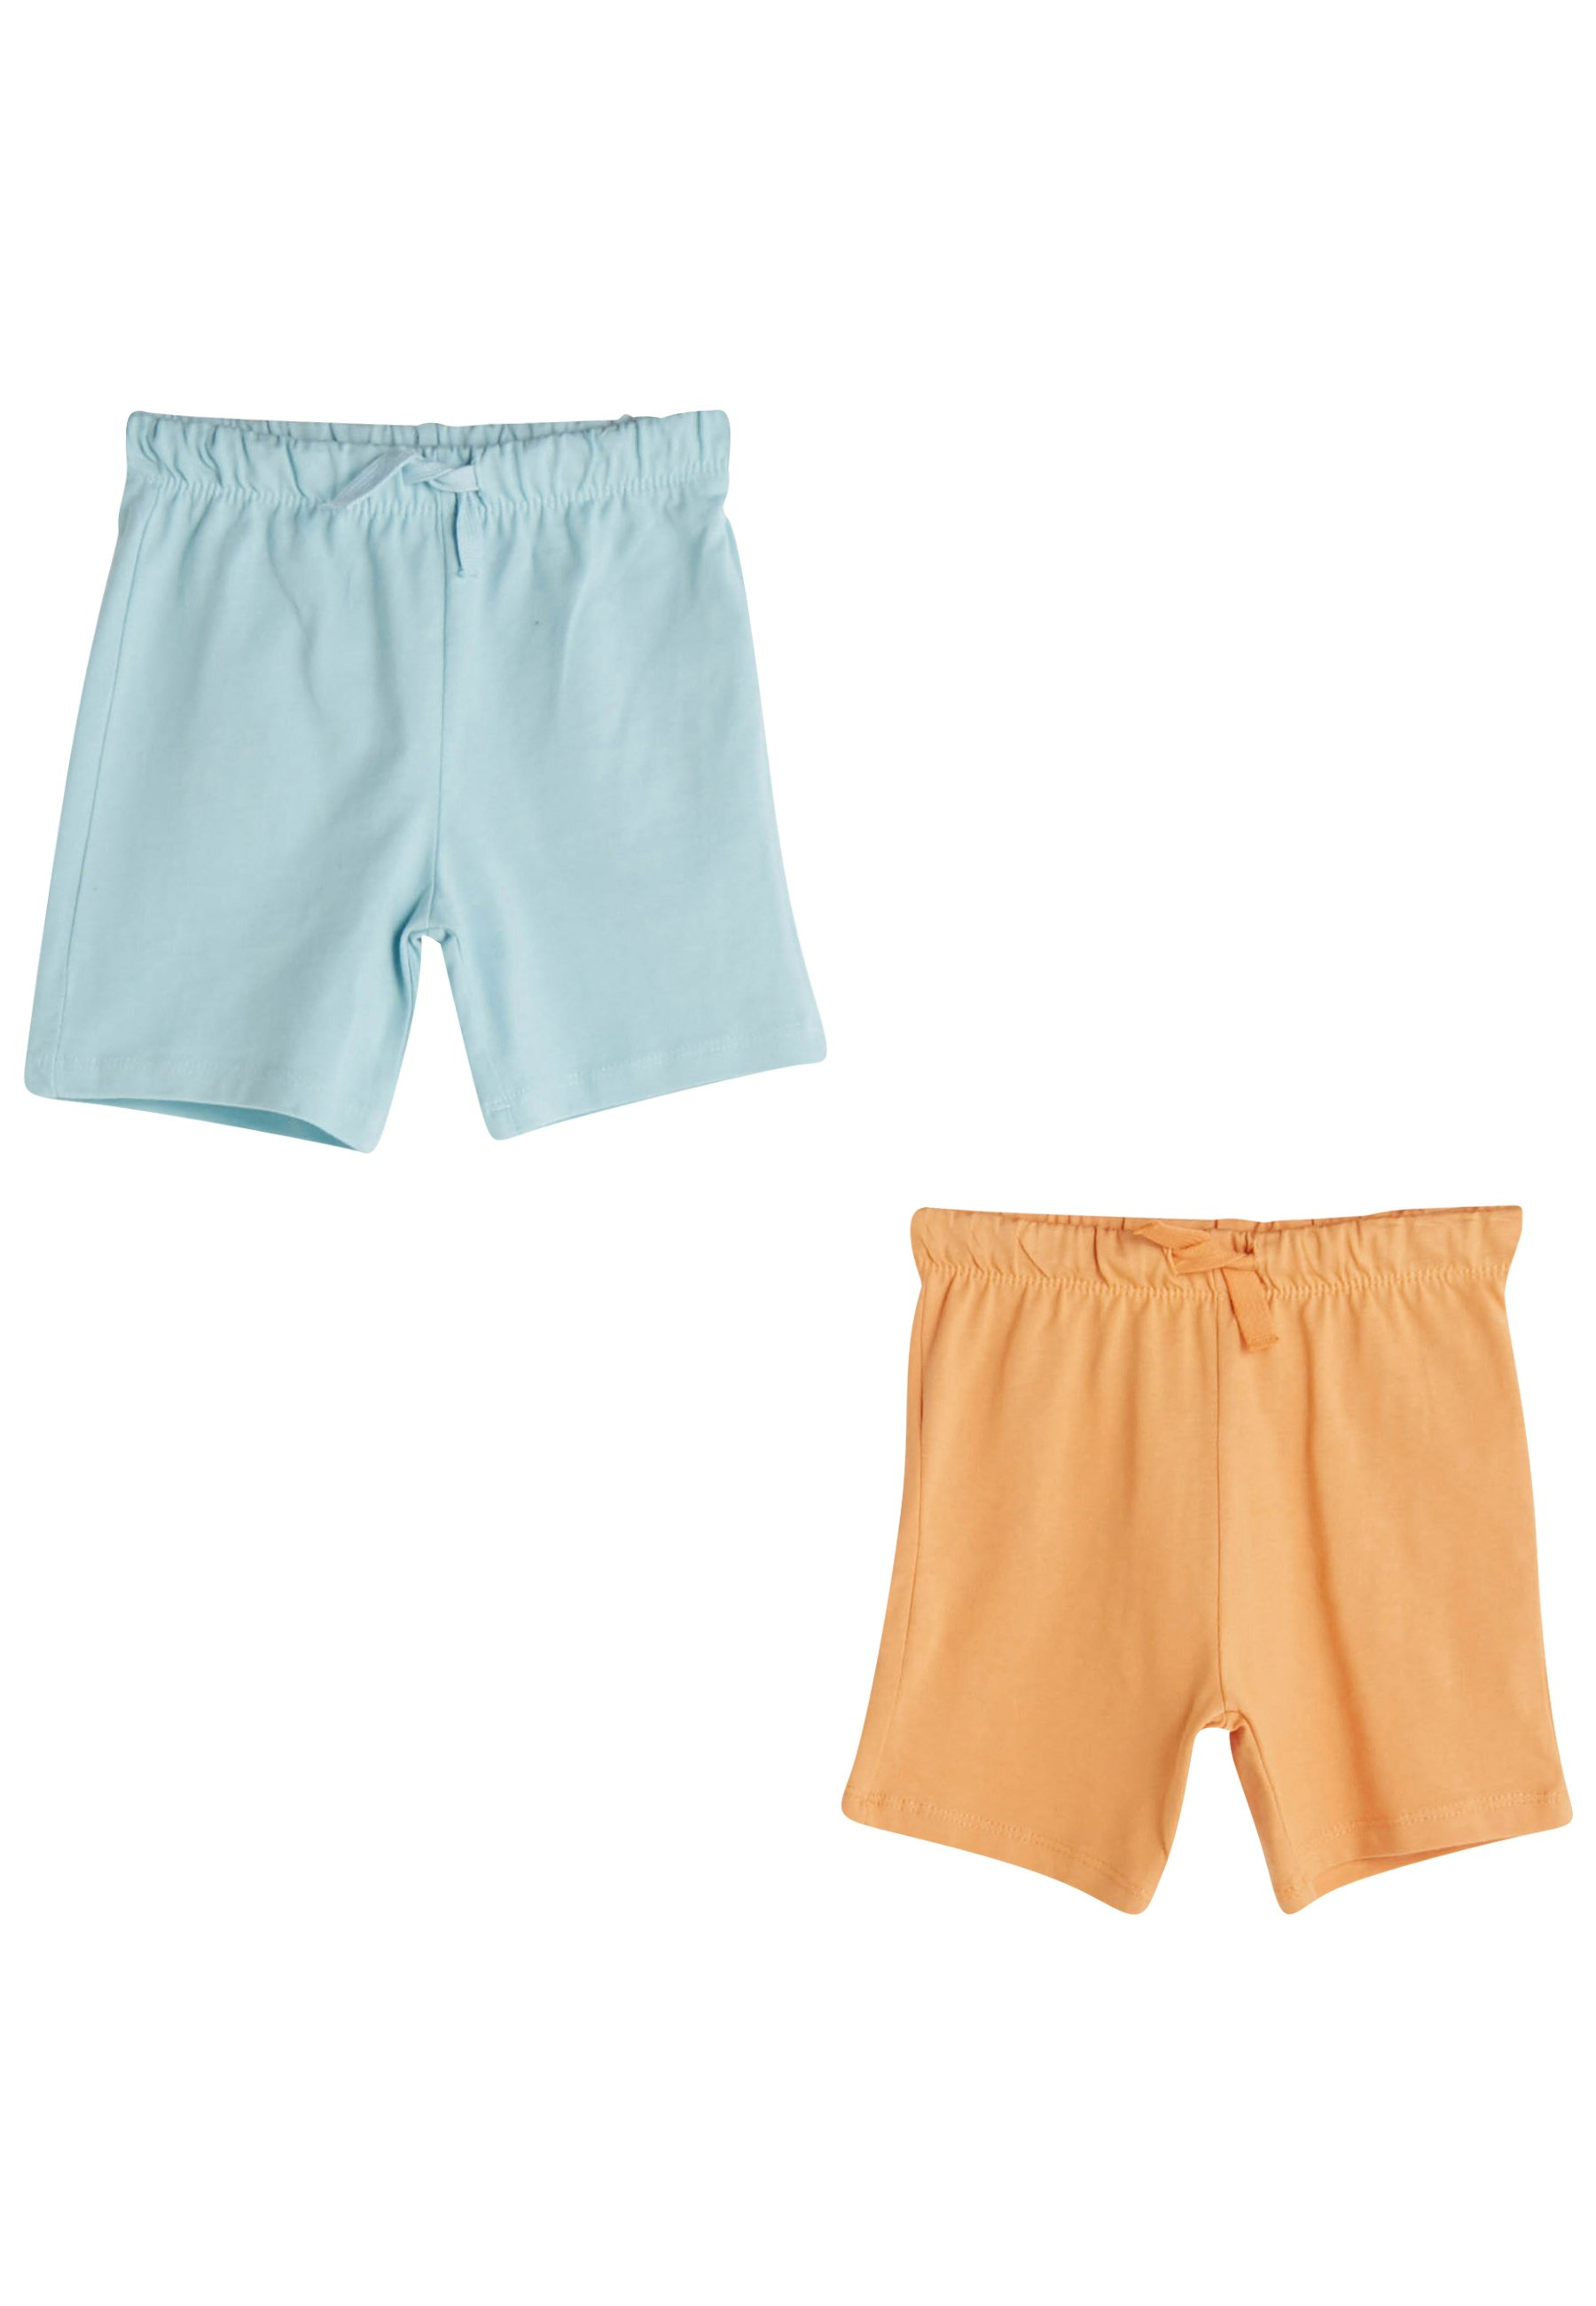 Bambini 2 PACK - Shorts